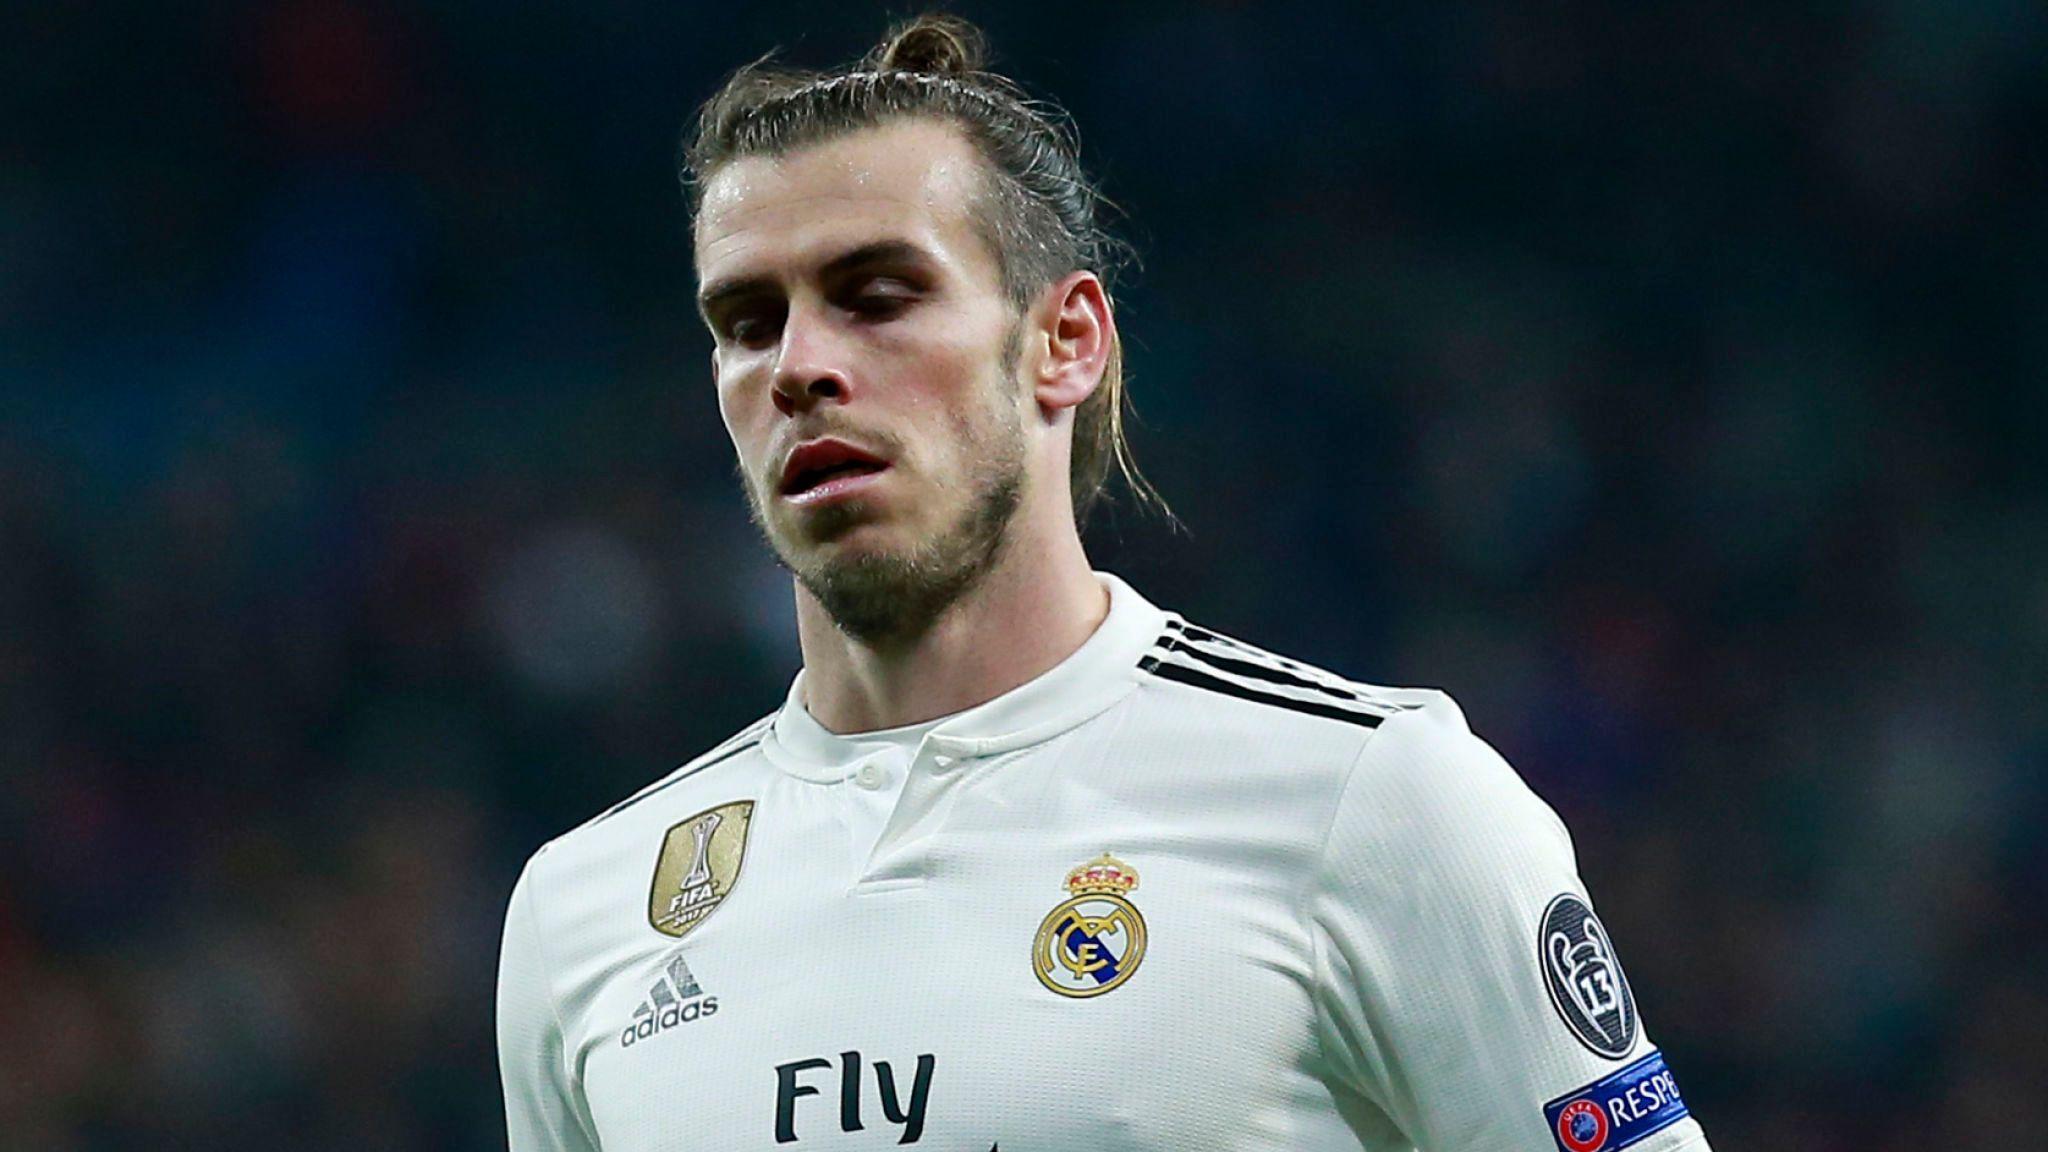 Gareth Bale Akan Absen Hadapi Real Valladolid